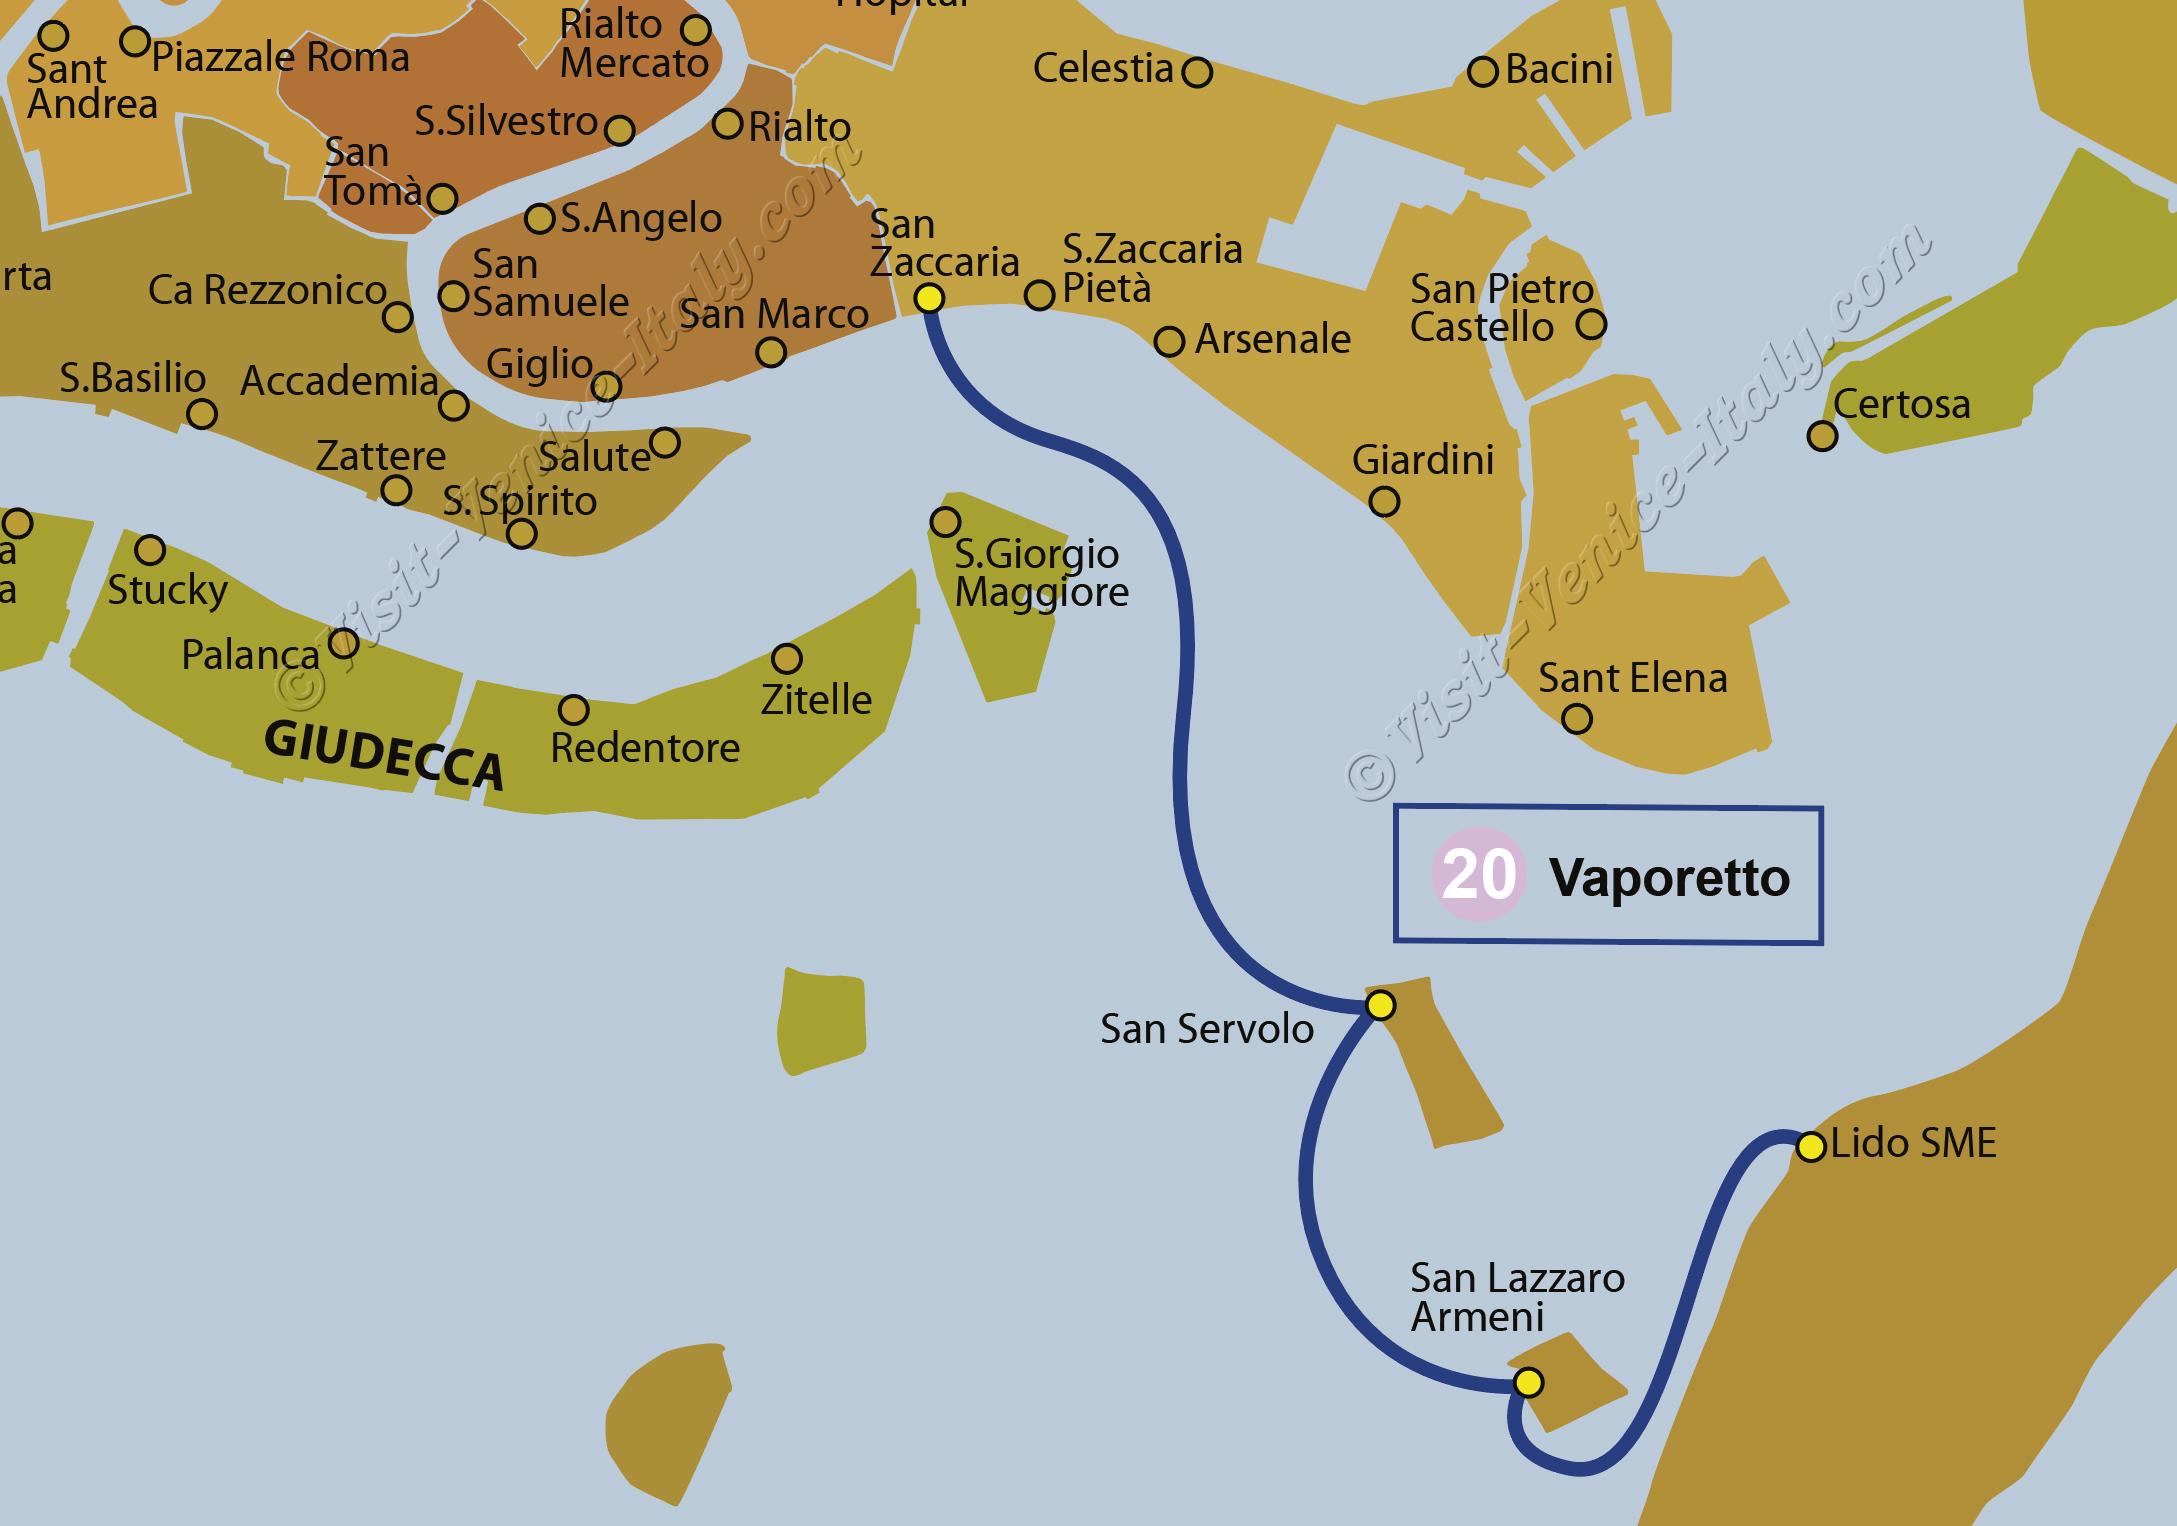 Water Bus Venice Vaporetto Map of Line 20 ACTV